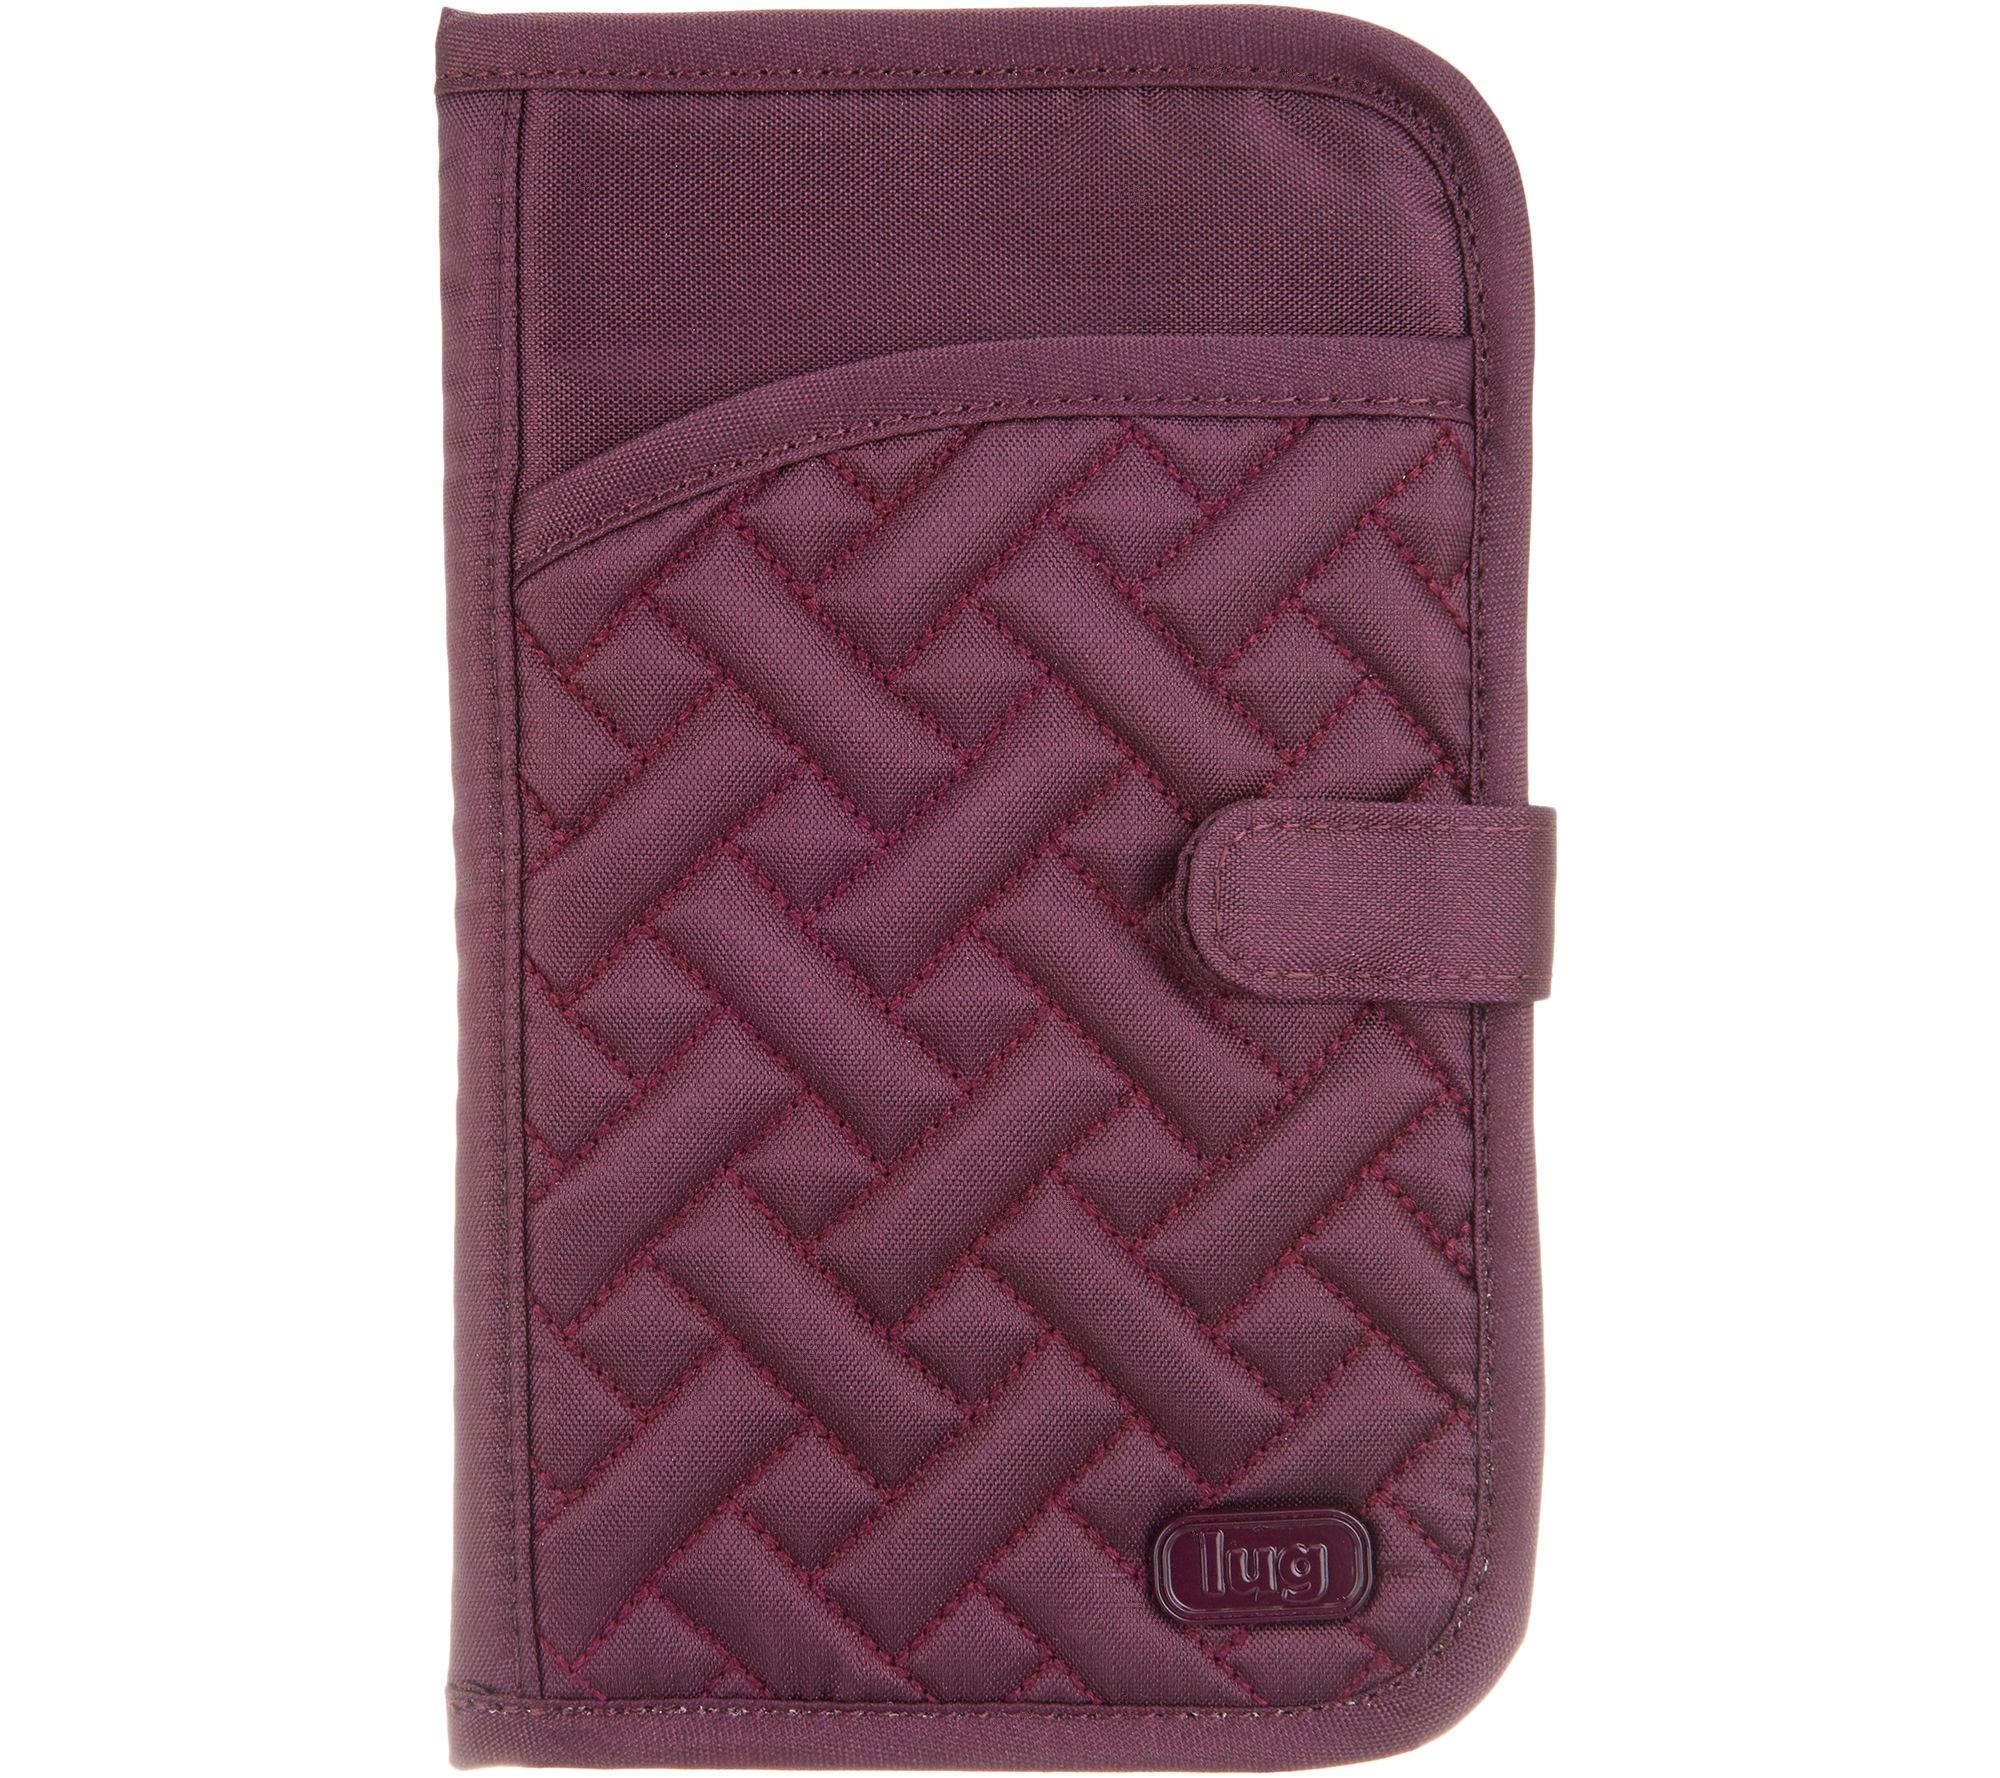 6d8abd33ed86 Lug North/South RFID Wallet - Tandem Snap - Page 1 — QVC.com